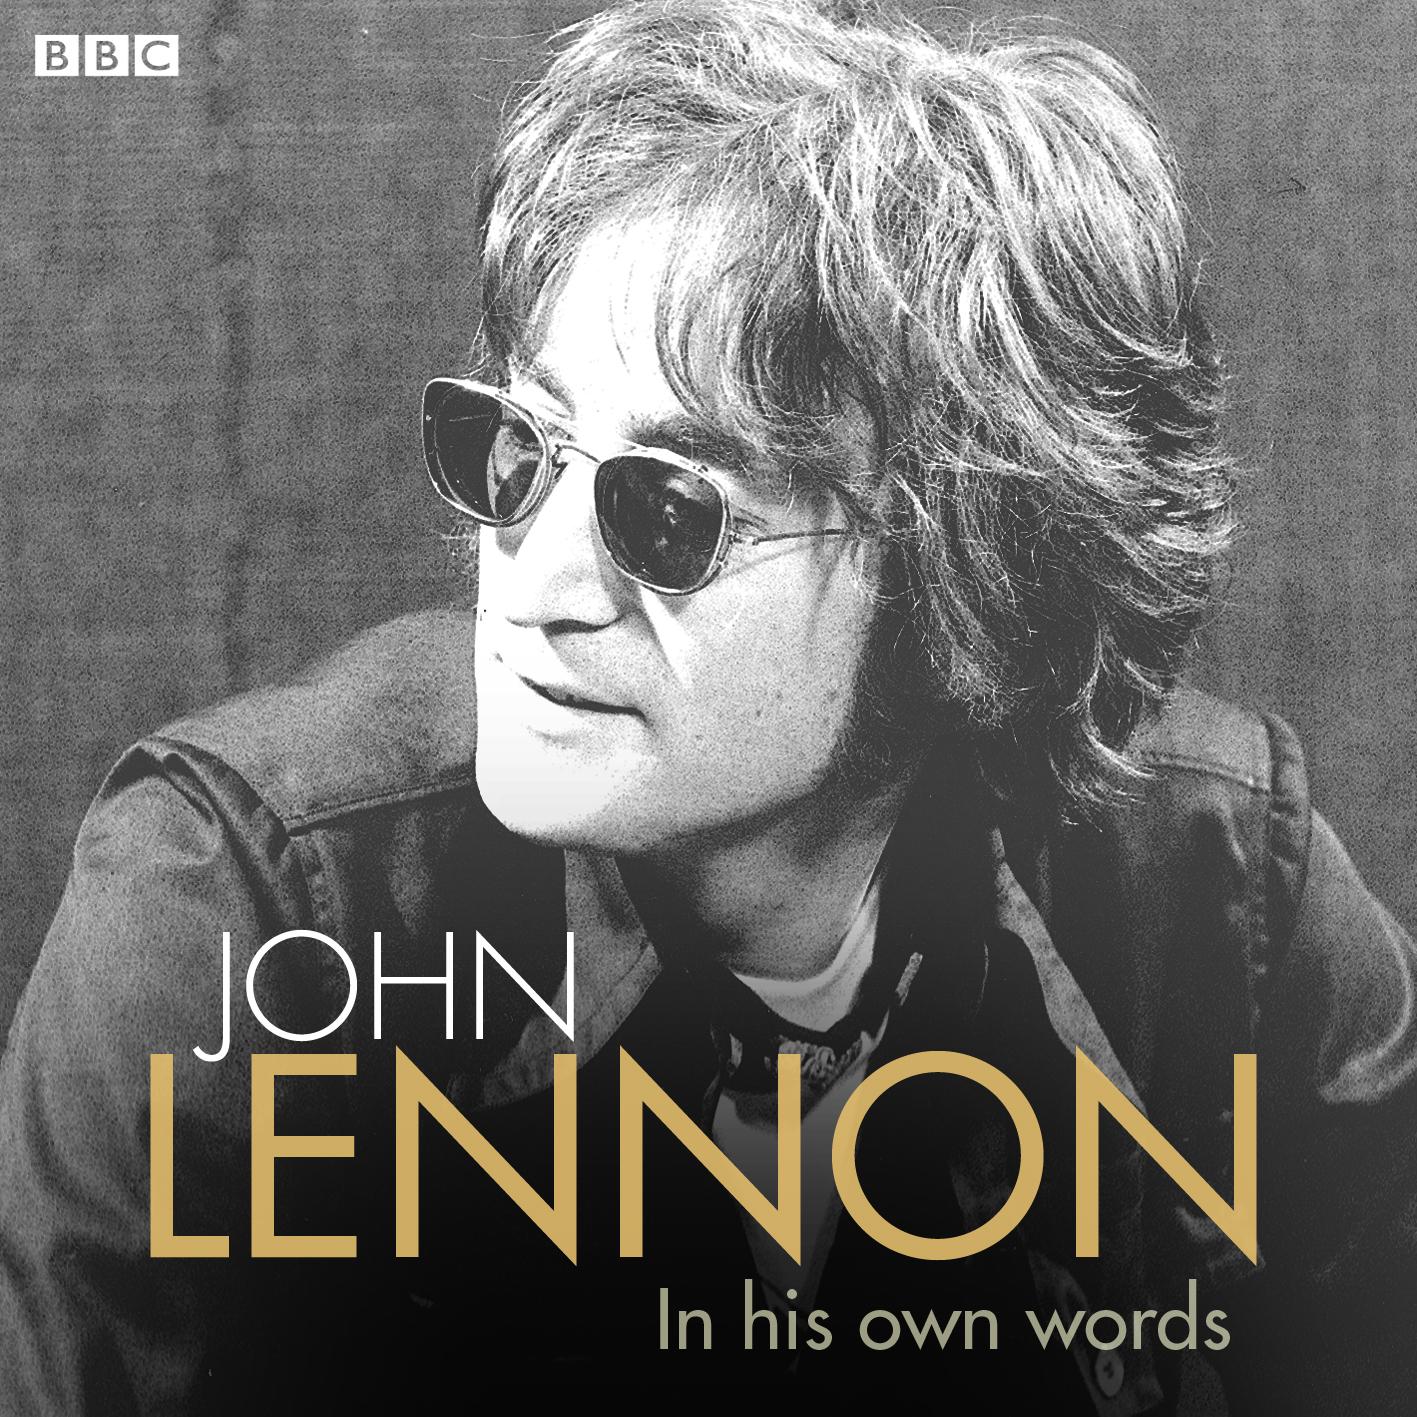 a biography of john lennon a member of the beatles Para keng aliwang gamit, lawen ye ing beatles (disambiguation) deng beatles manibat kaili papuntang wanan: paul mccartney , ringo starr , george harrison , john lennon.